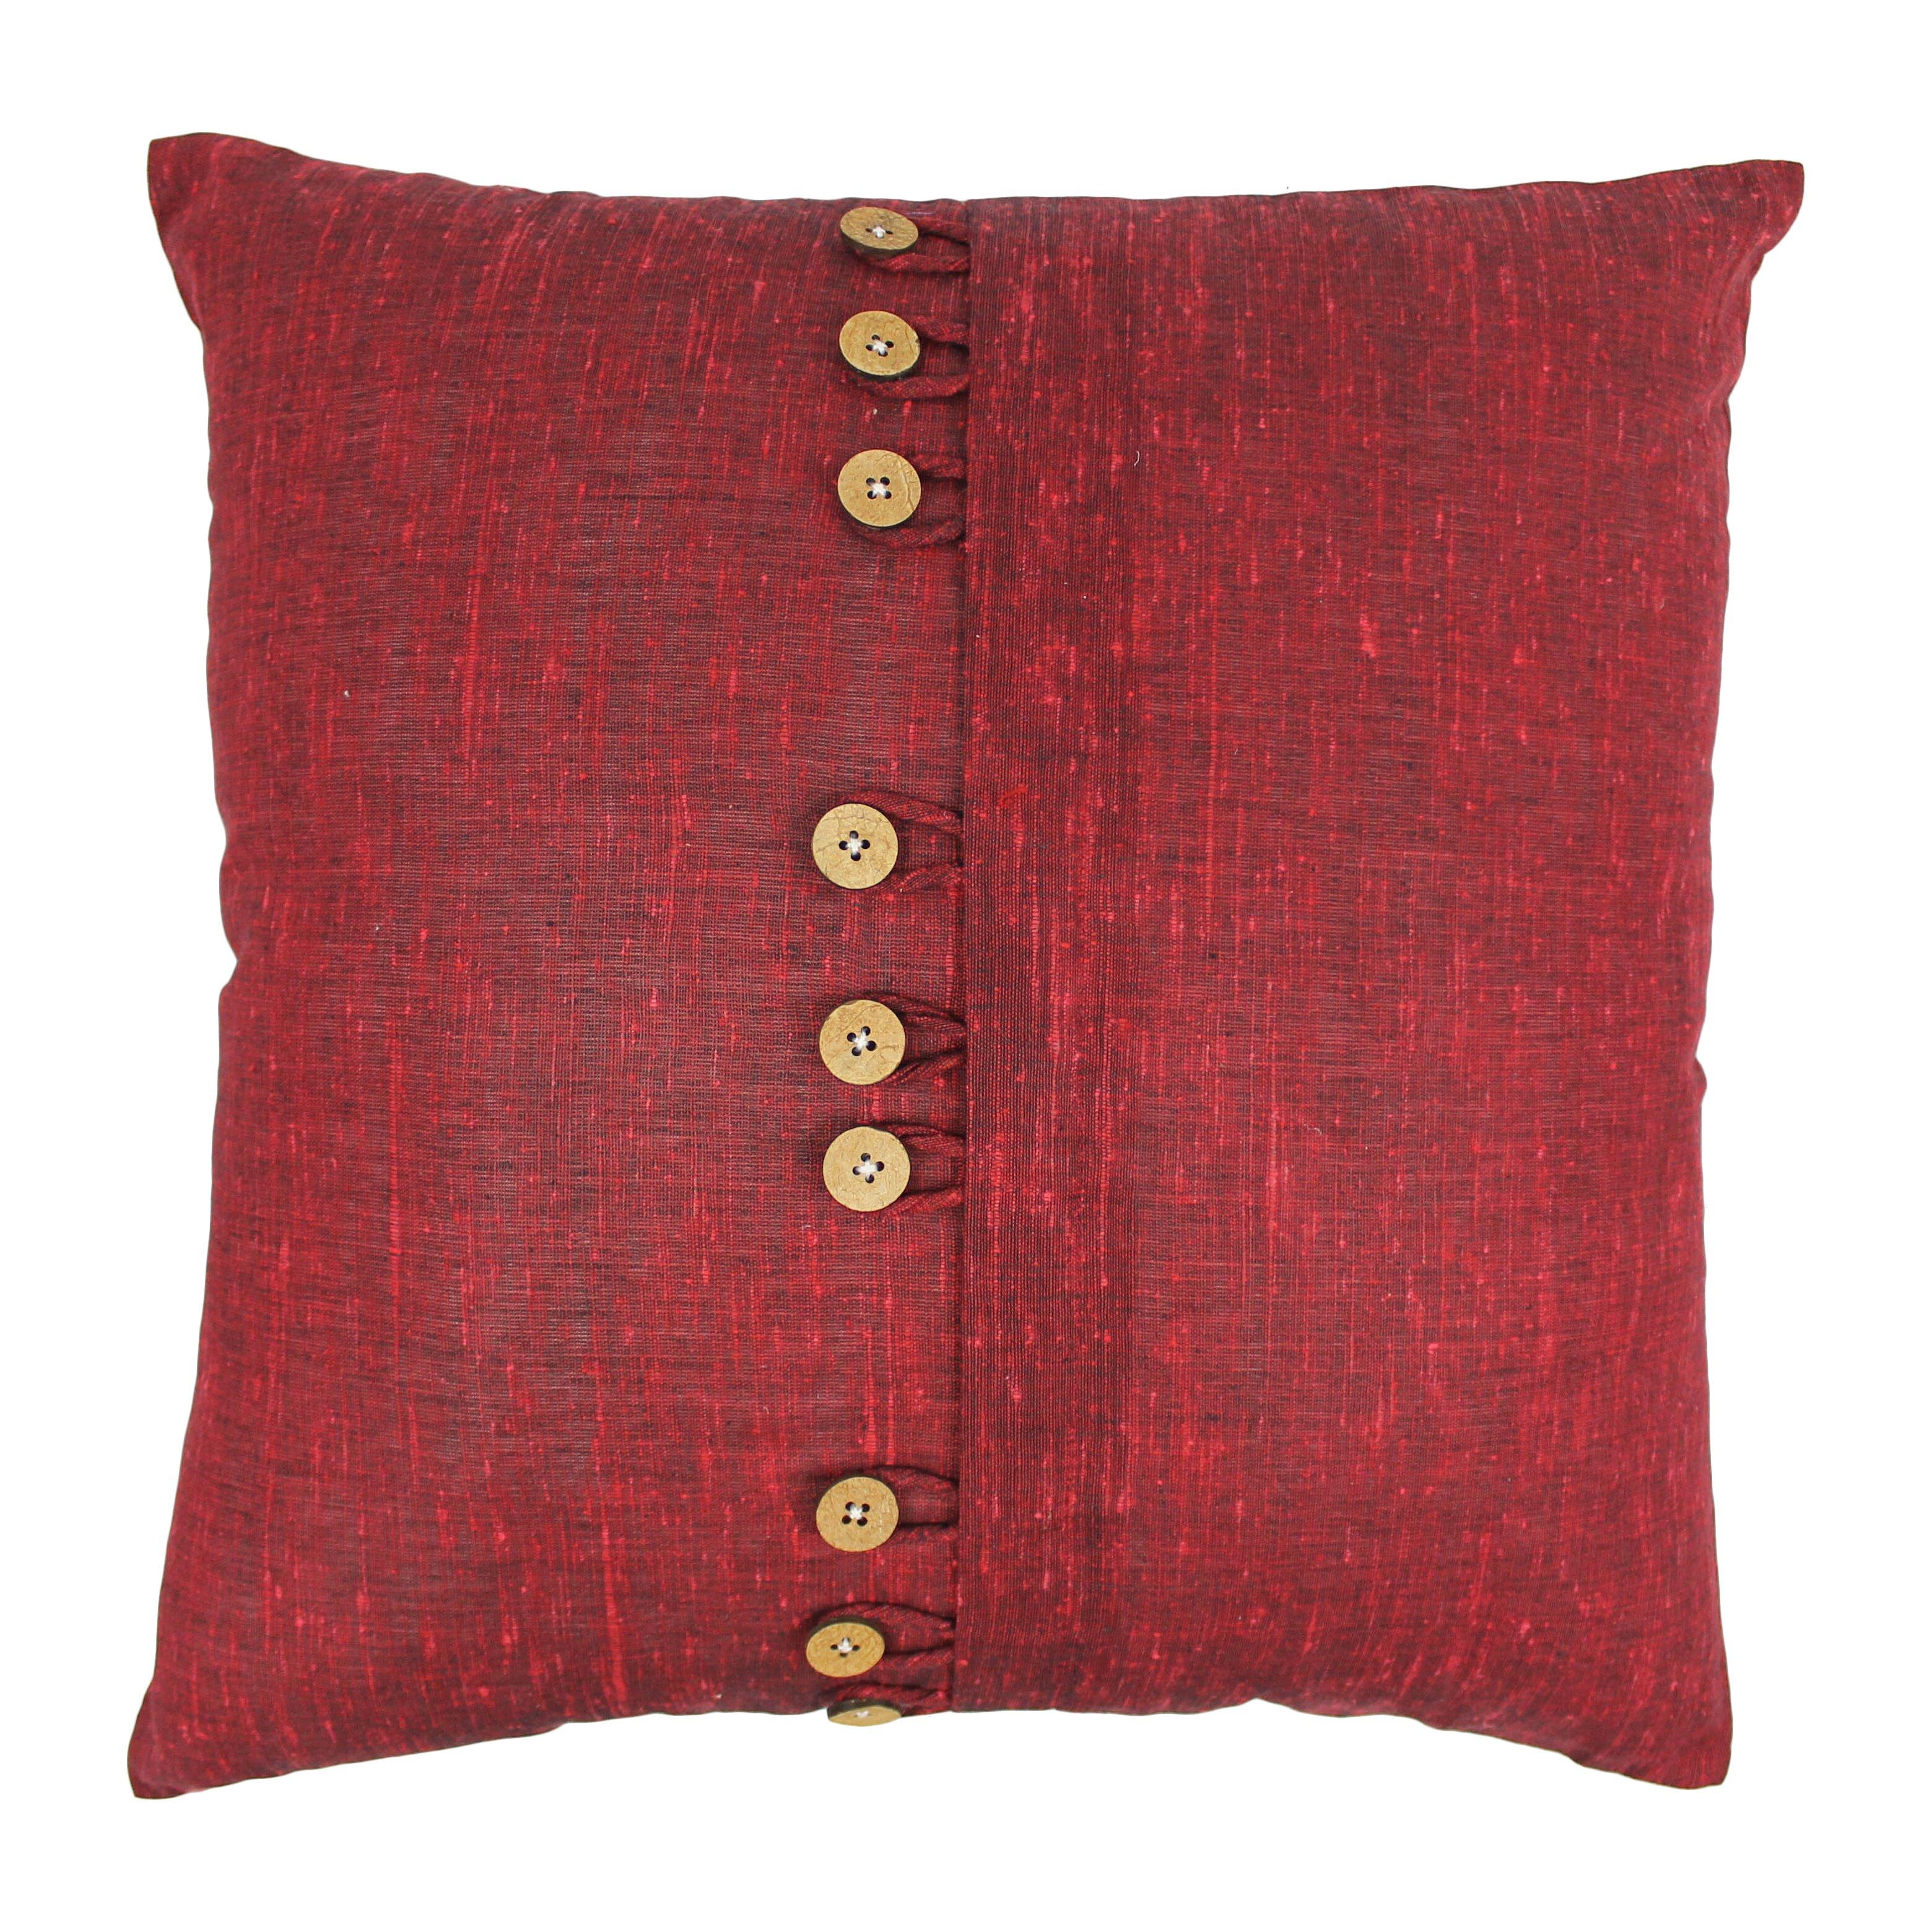 Throw Pillows With Big Buttons : Blazing Needles Nine Button Throw Pillow & Reviews Wayfair